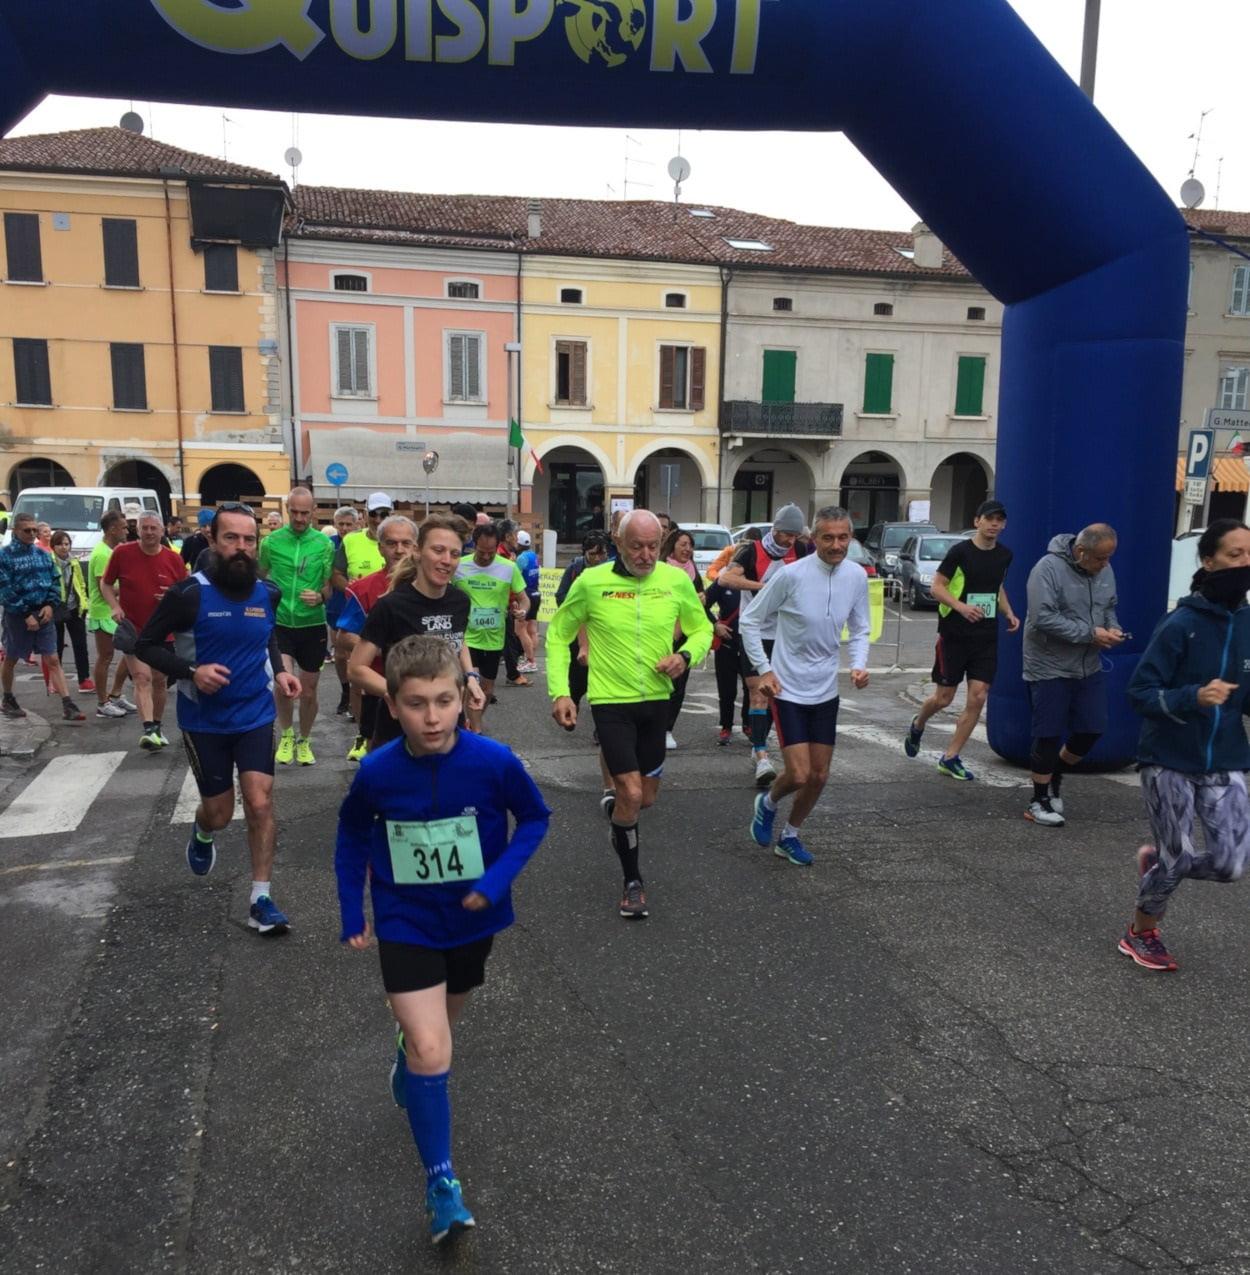 2019|| 29.04 – Millepiedi per Gonzaga – Corsa podistica